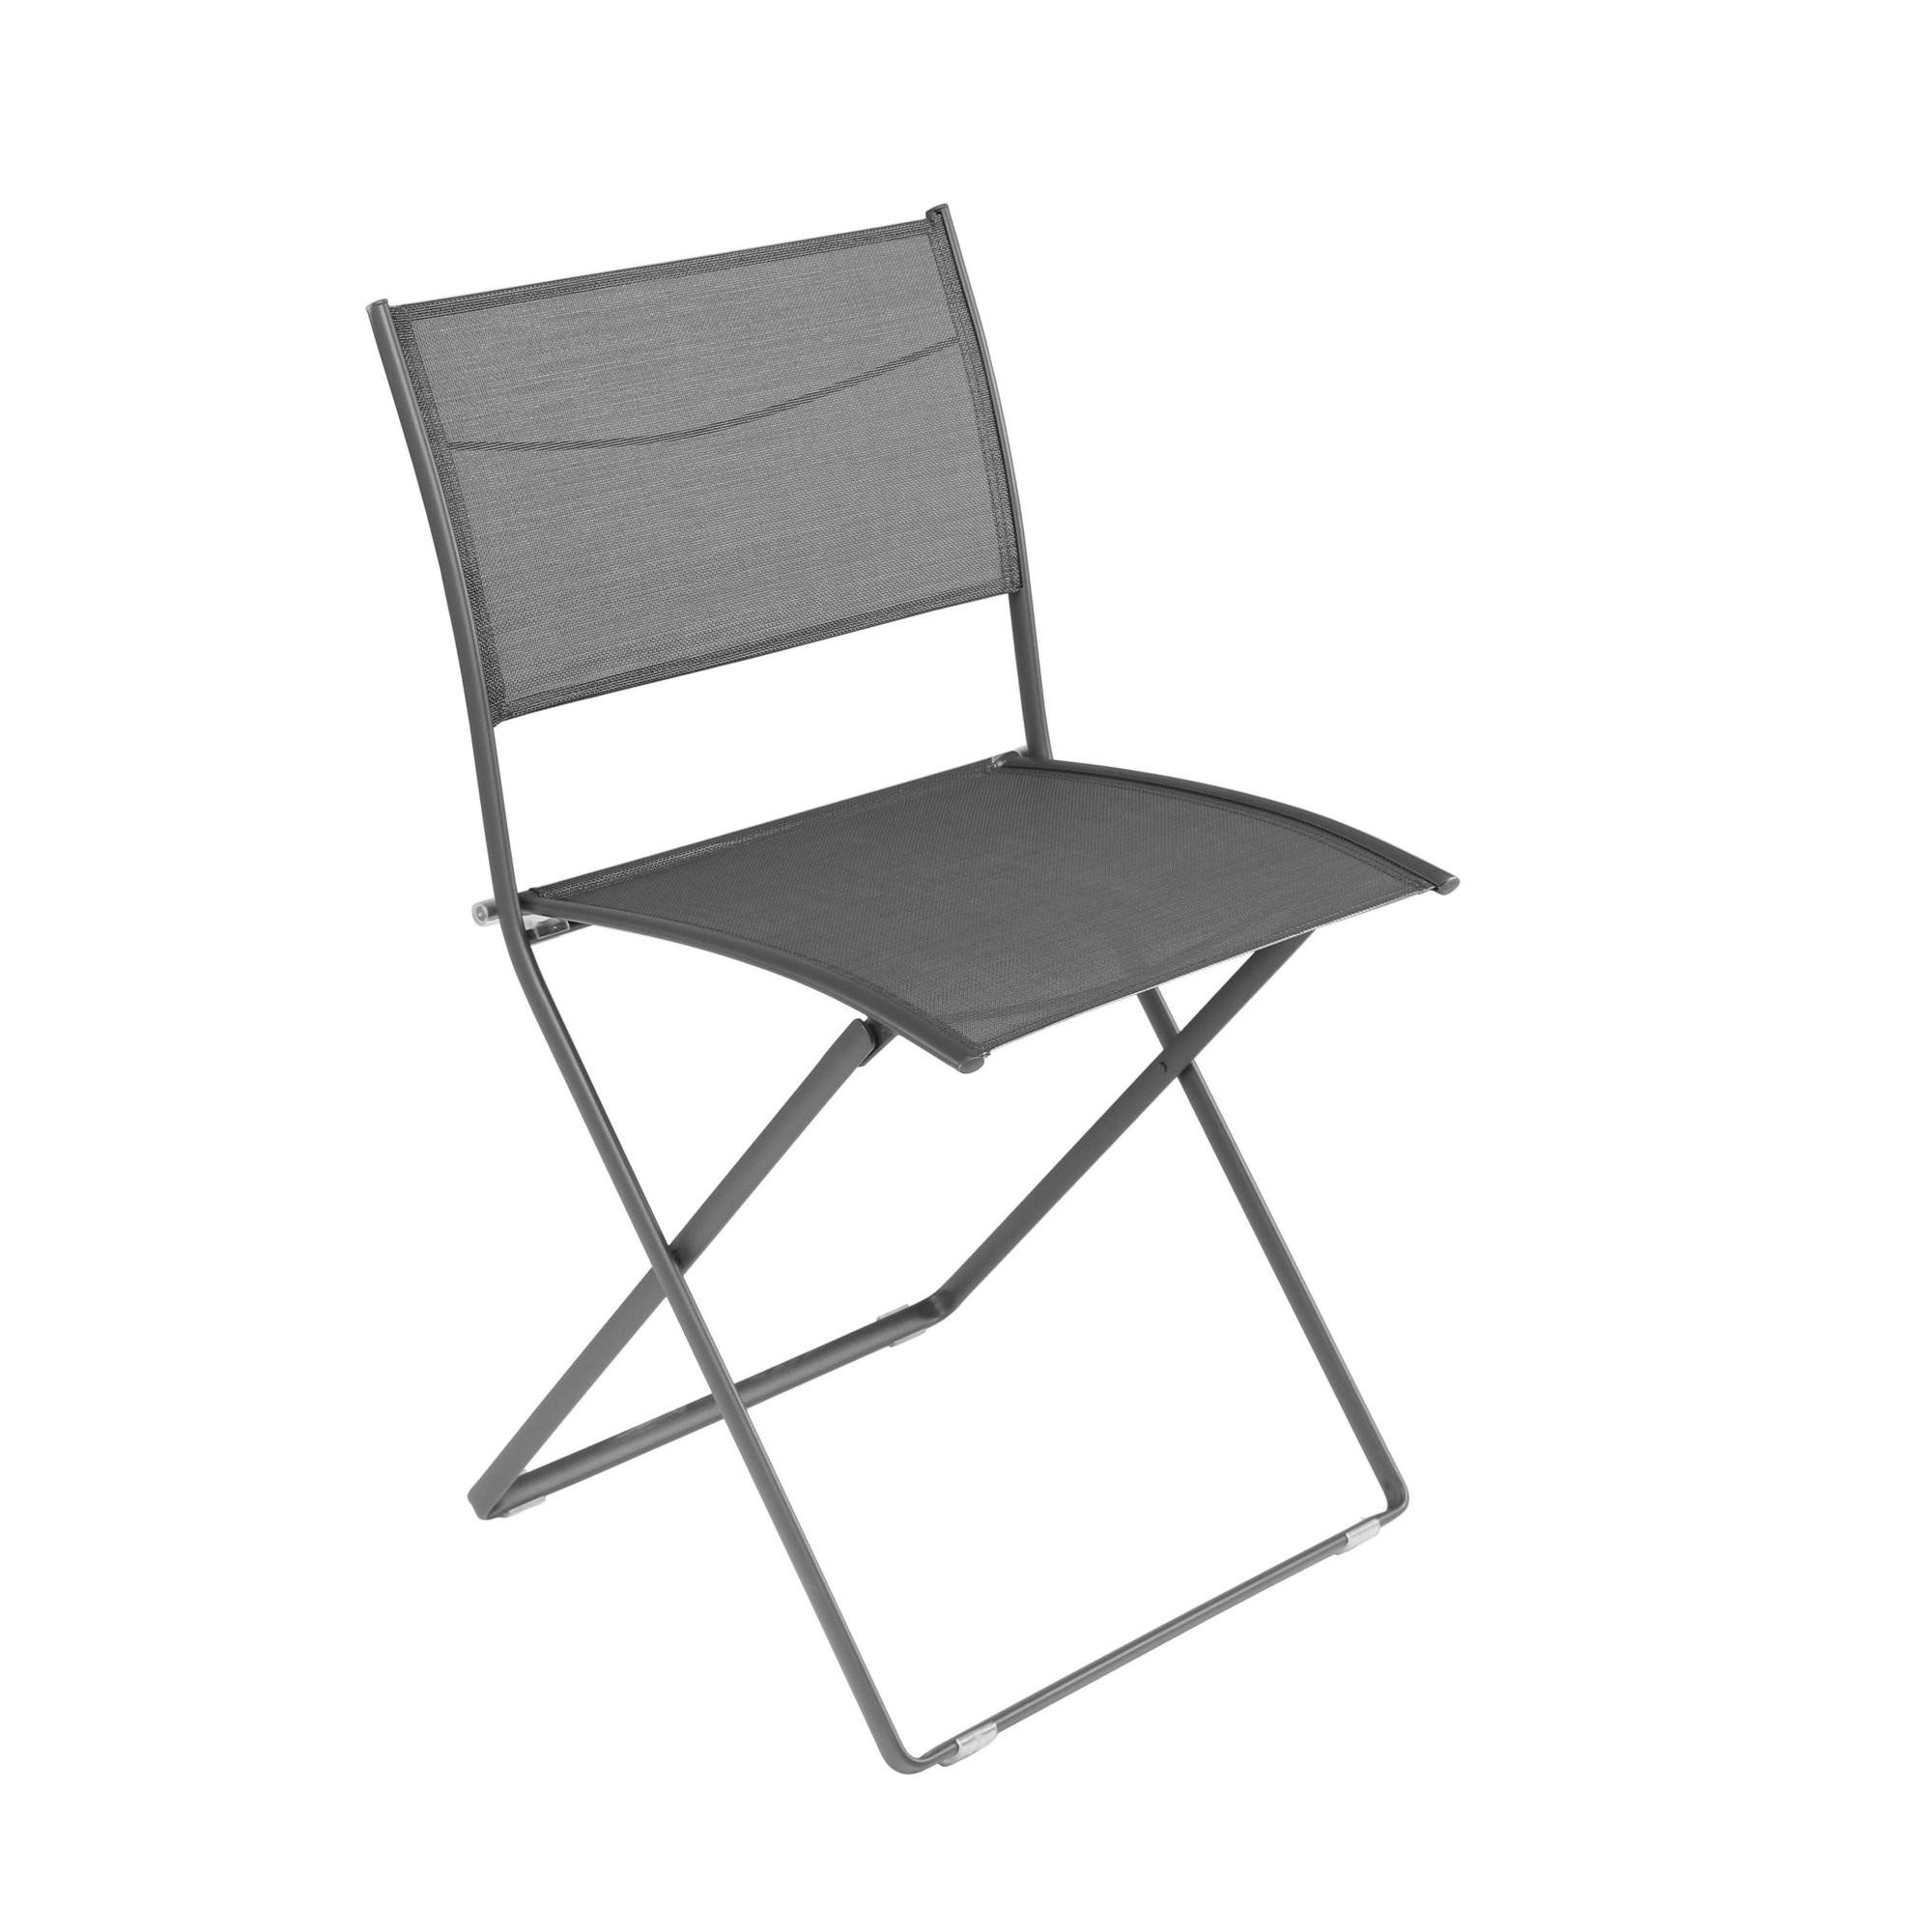 chaise pliante plein air de fermob gris orage. Black Bedroom Furniture Sets. Home Design Ideas